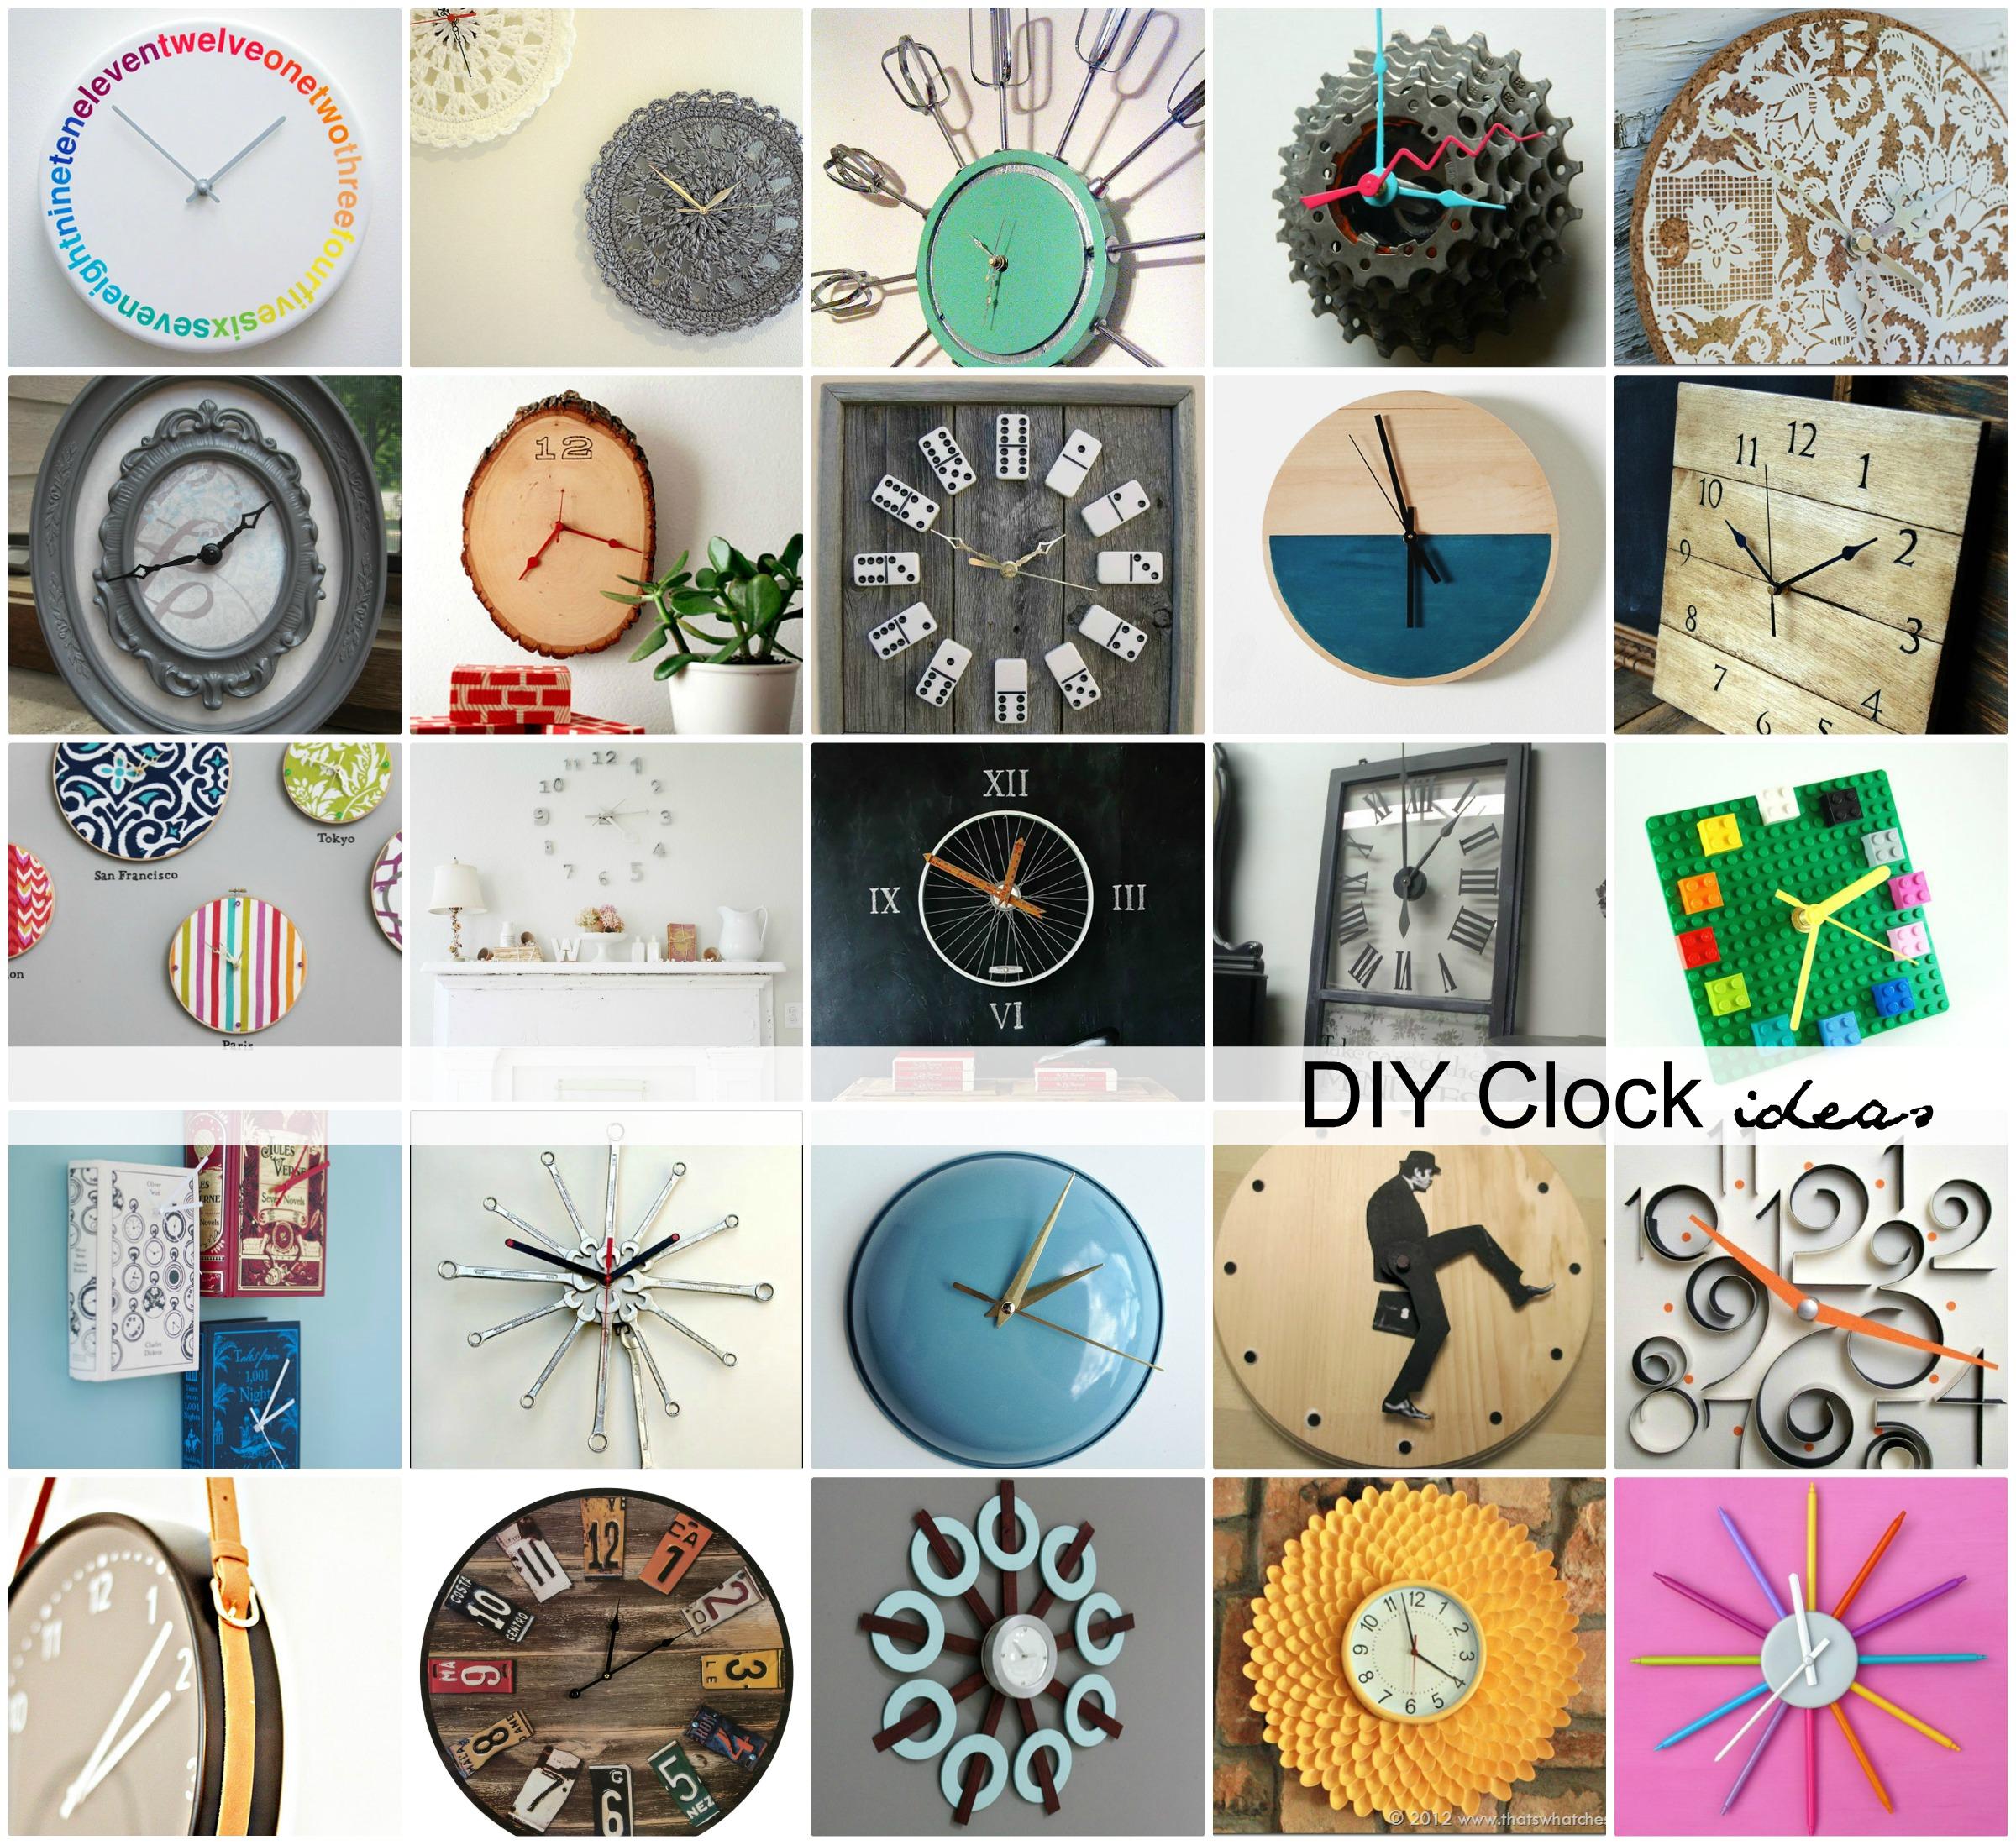 DIY-Clock-Ideas-1